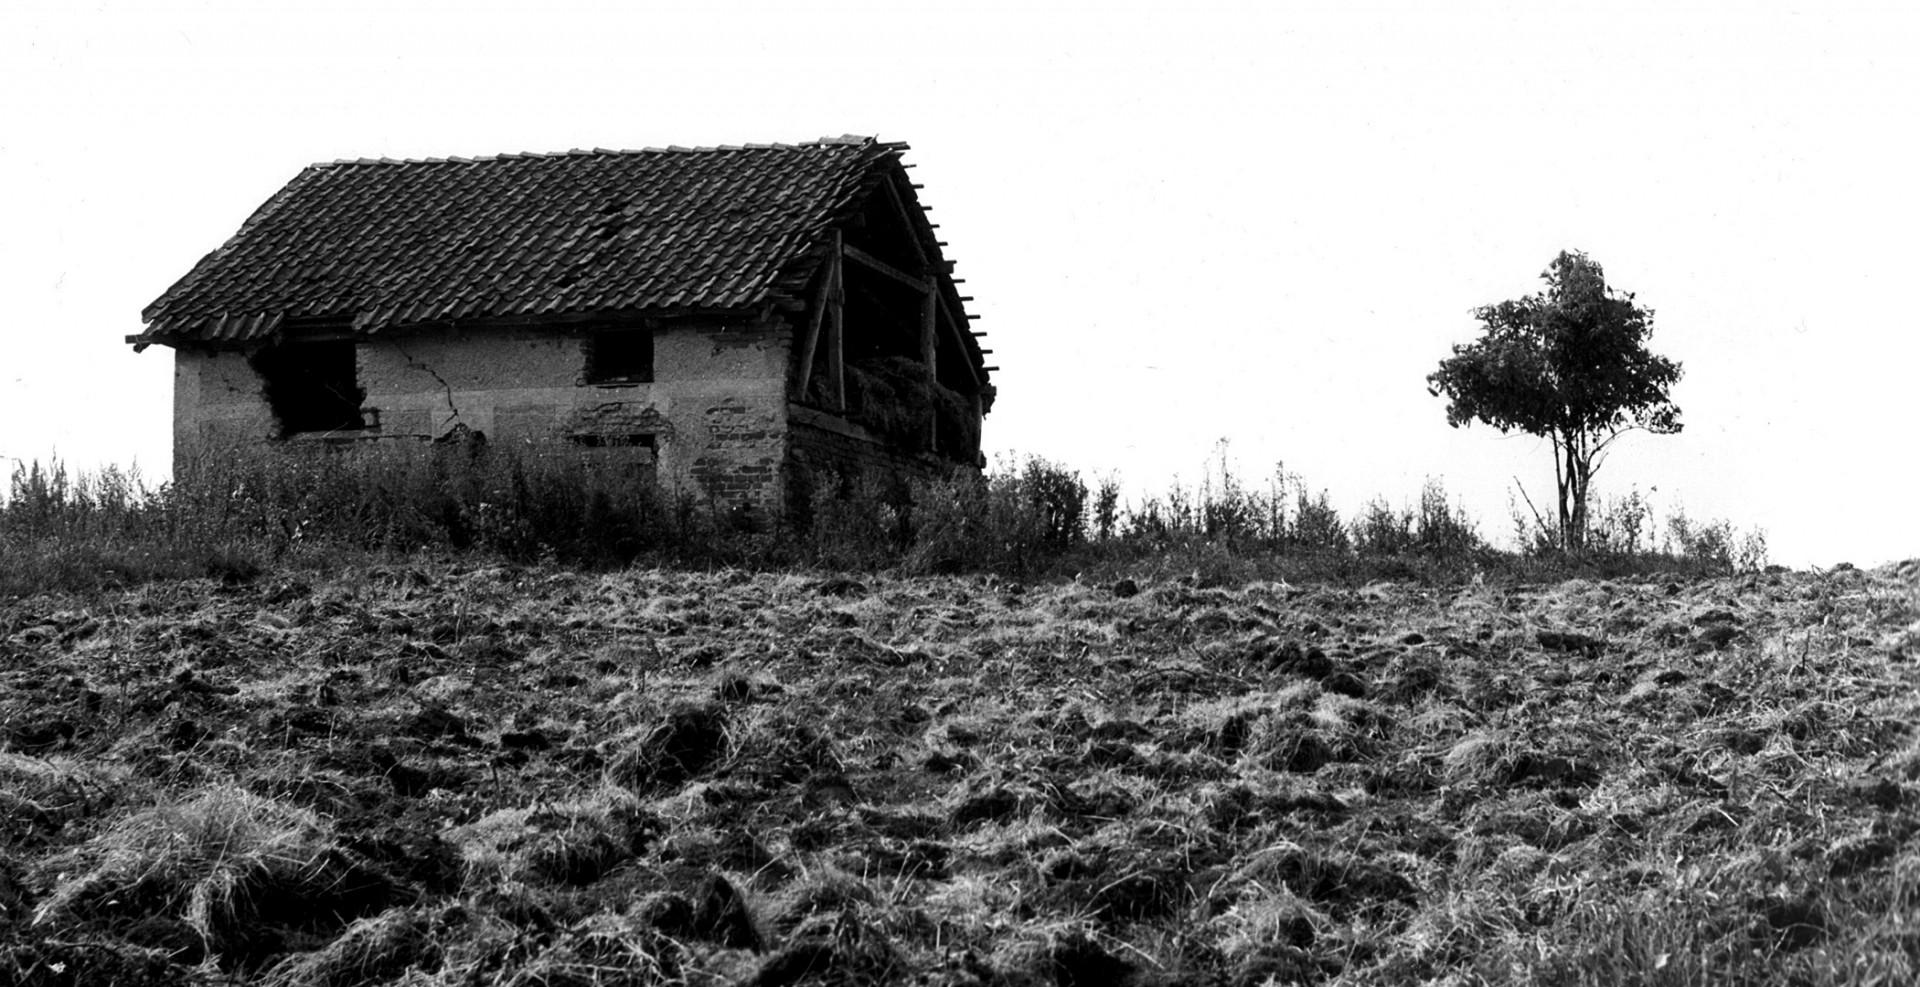 Reportage-Fotograf-in-Paris-Reportage-Fotografie-Haus-mit-Baum-in-Polen